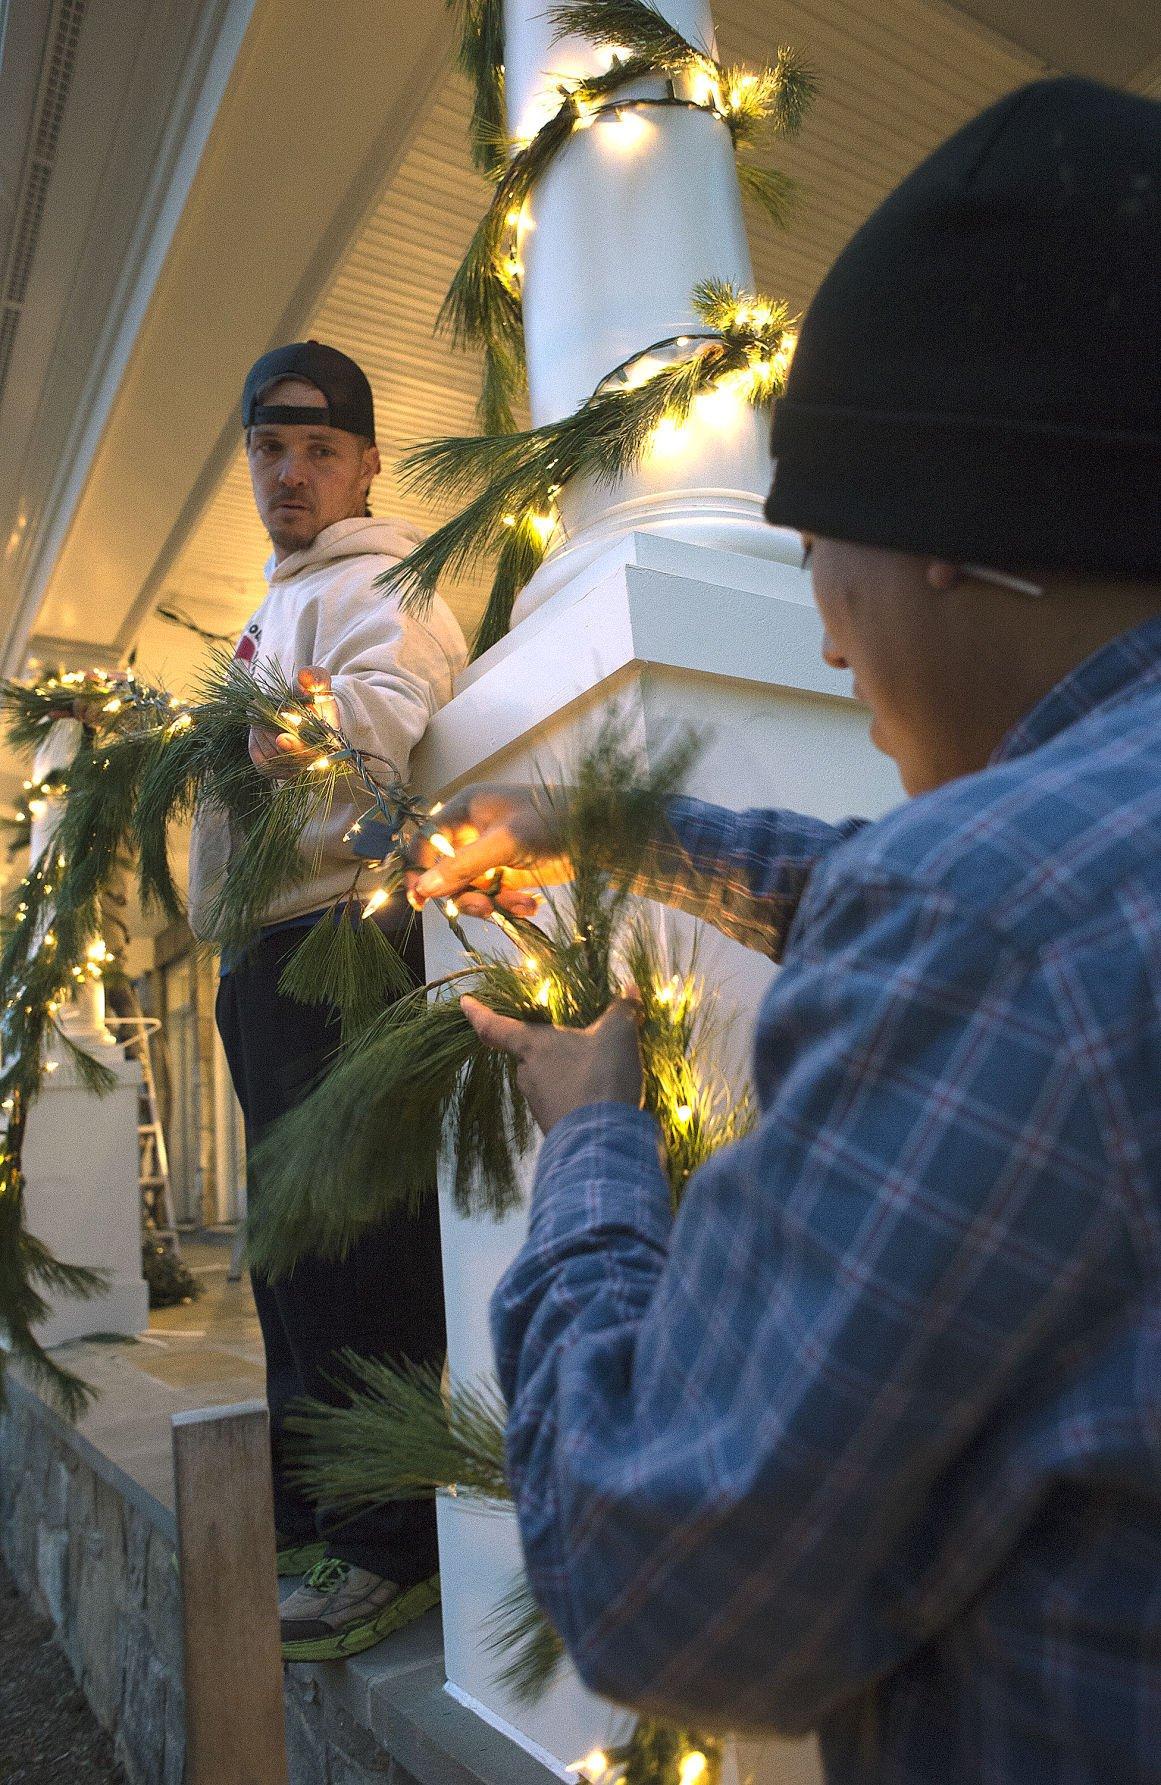 DG Christmas lights decorating 4